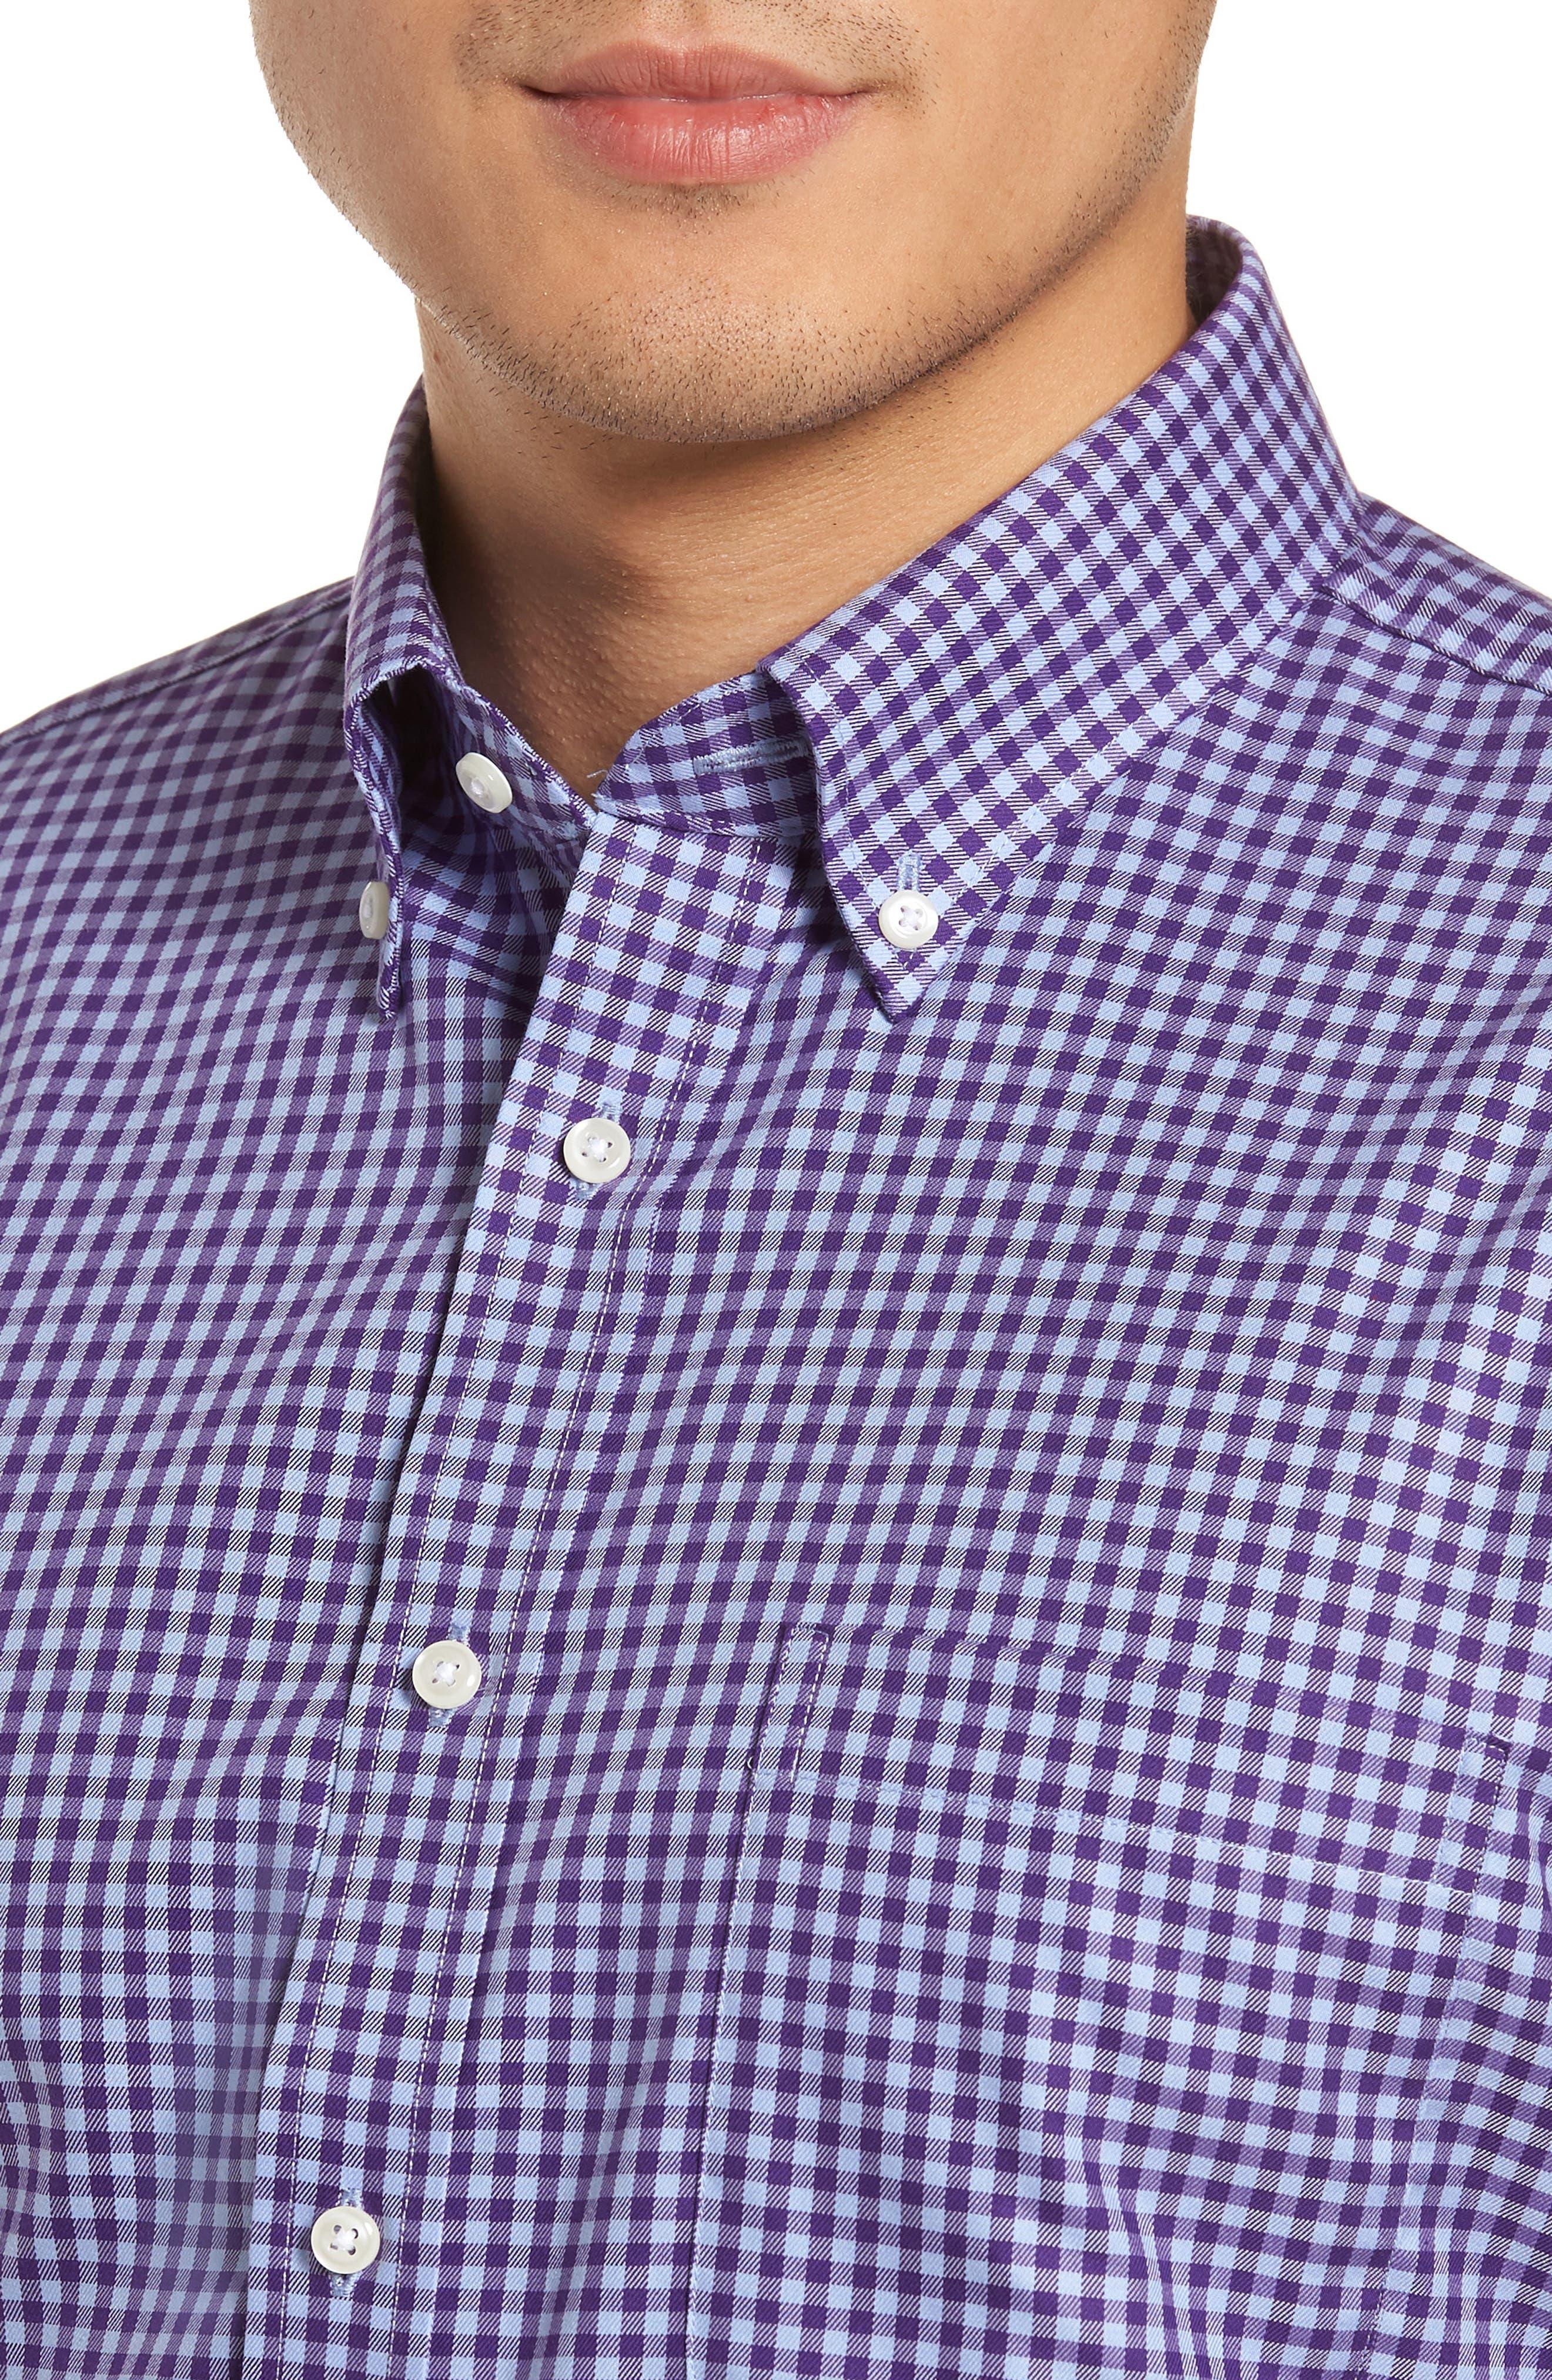 Alternate Image 4  - Nordstrom Men's Shop Trim Fit Non-Iron Gingham Dress Shirt